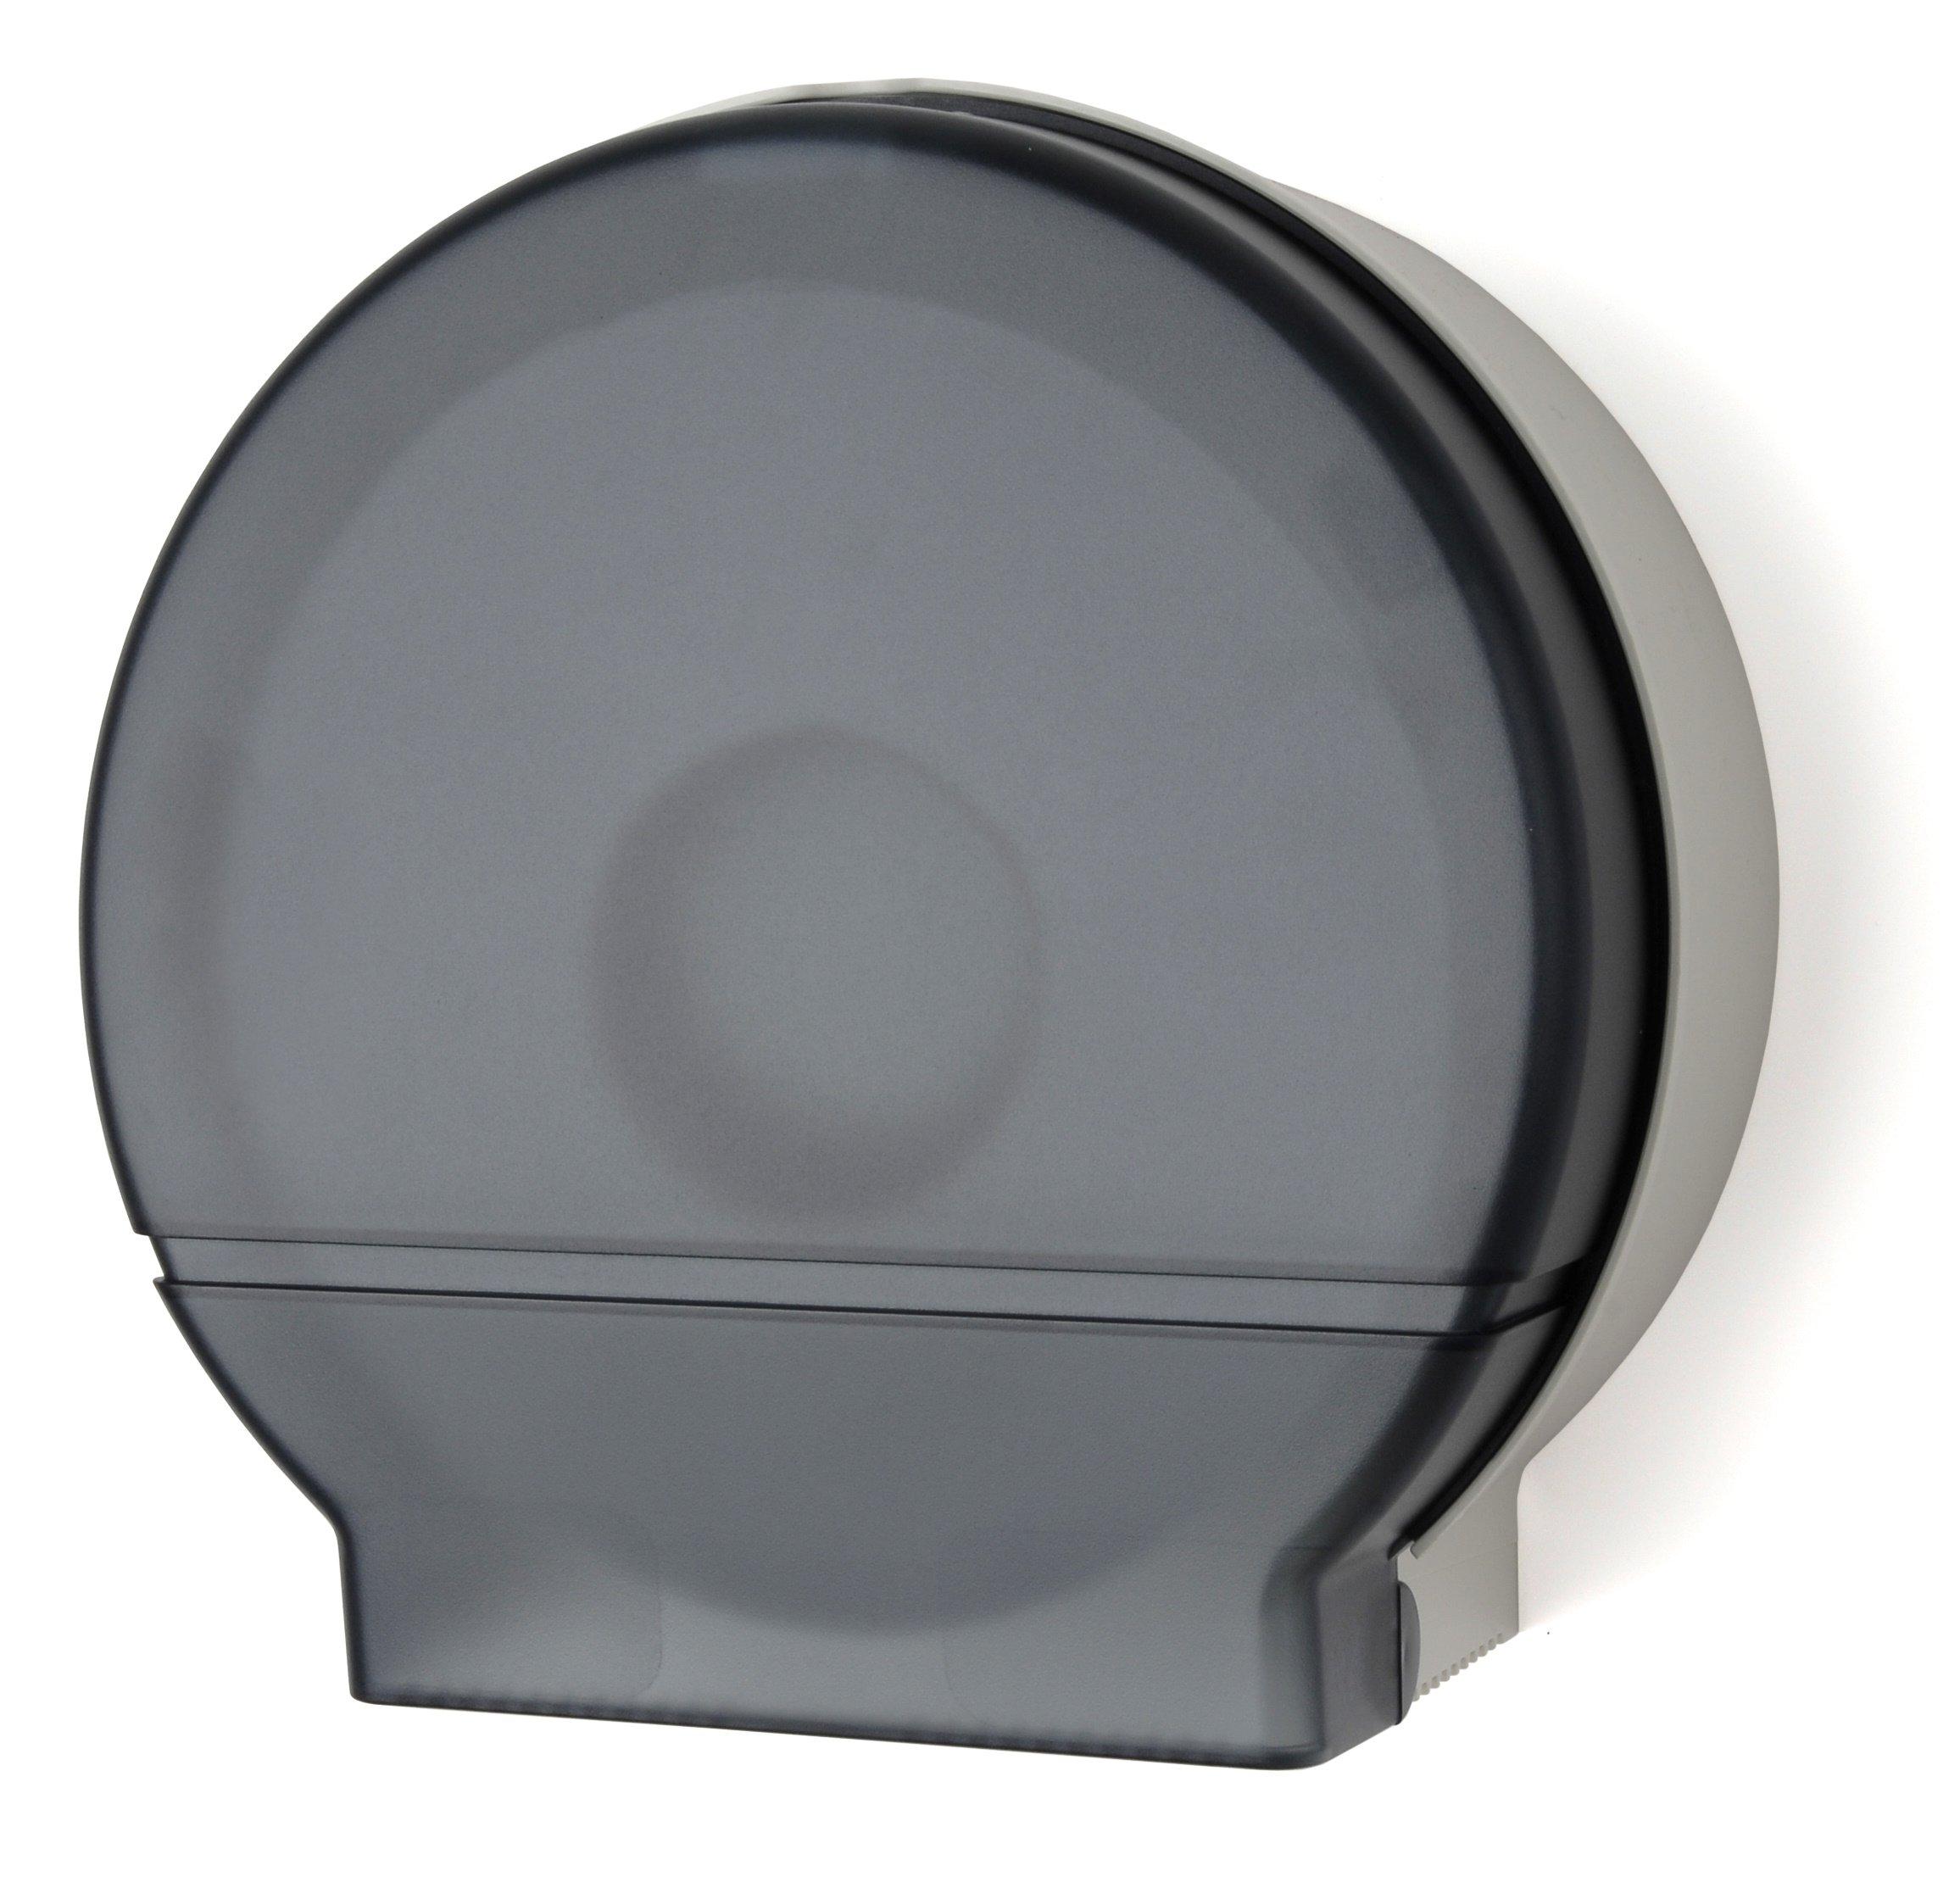 Palmer Fixture RD0026-01F Single Roll Jumbo Tissue Dispenser with Core Adaptor, Dark Translucent